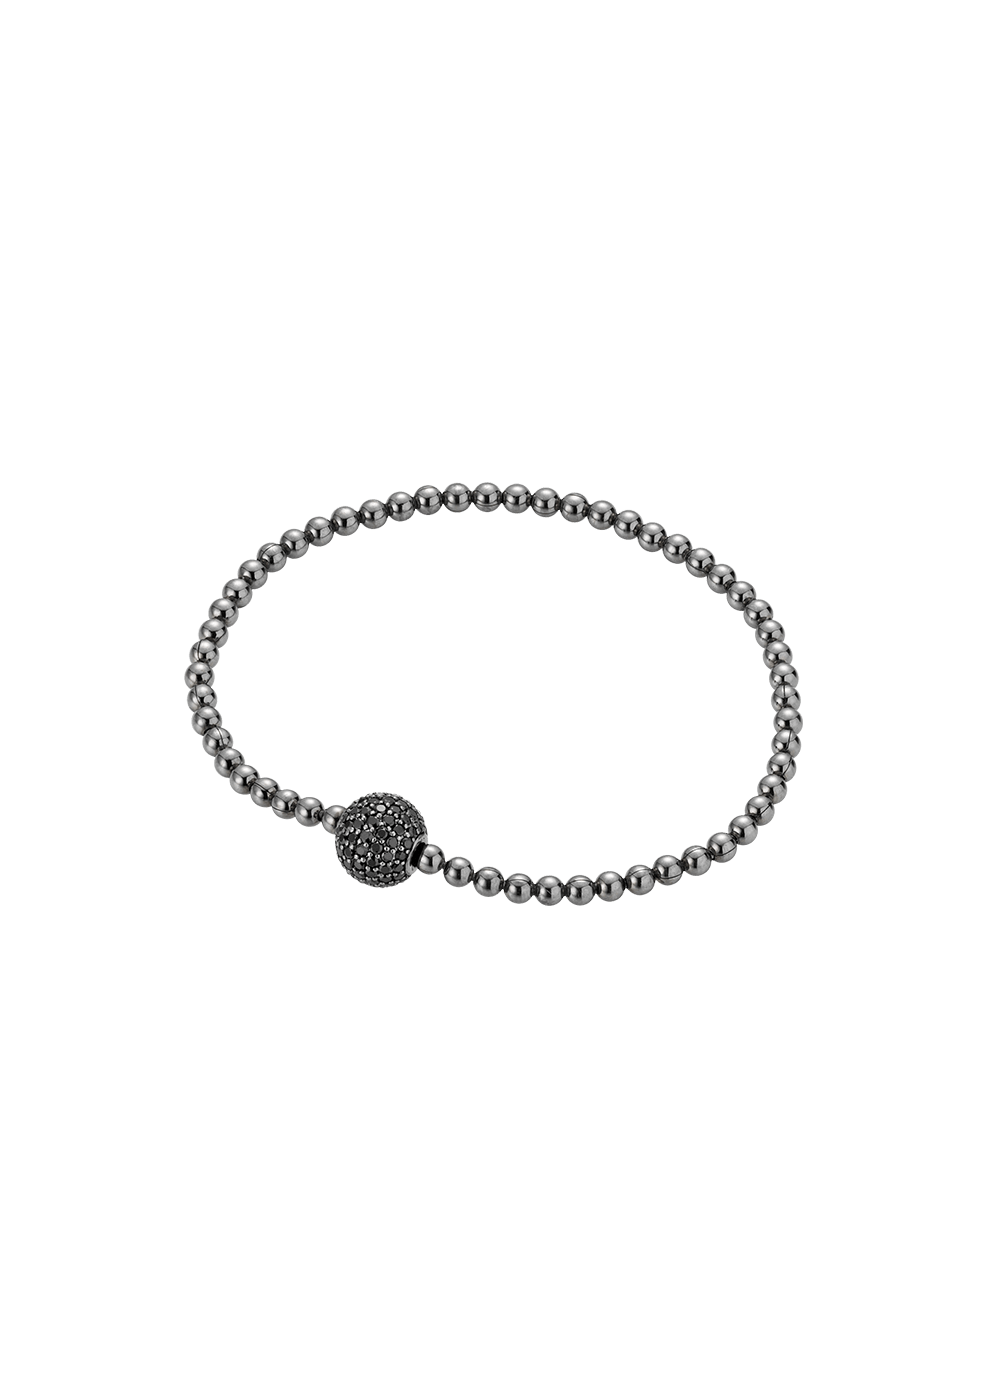 Gellner Perlen Armband